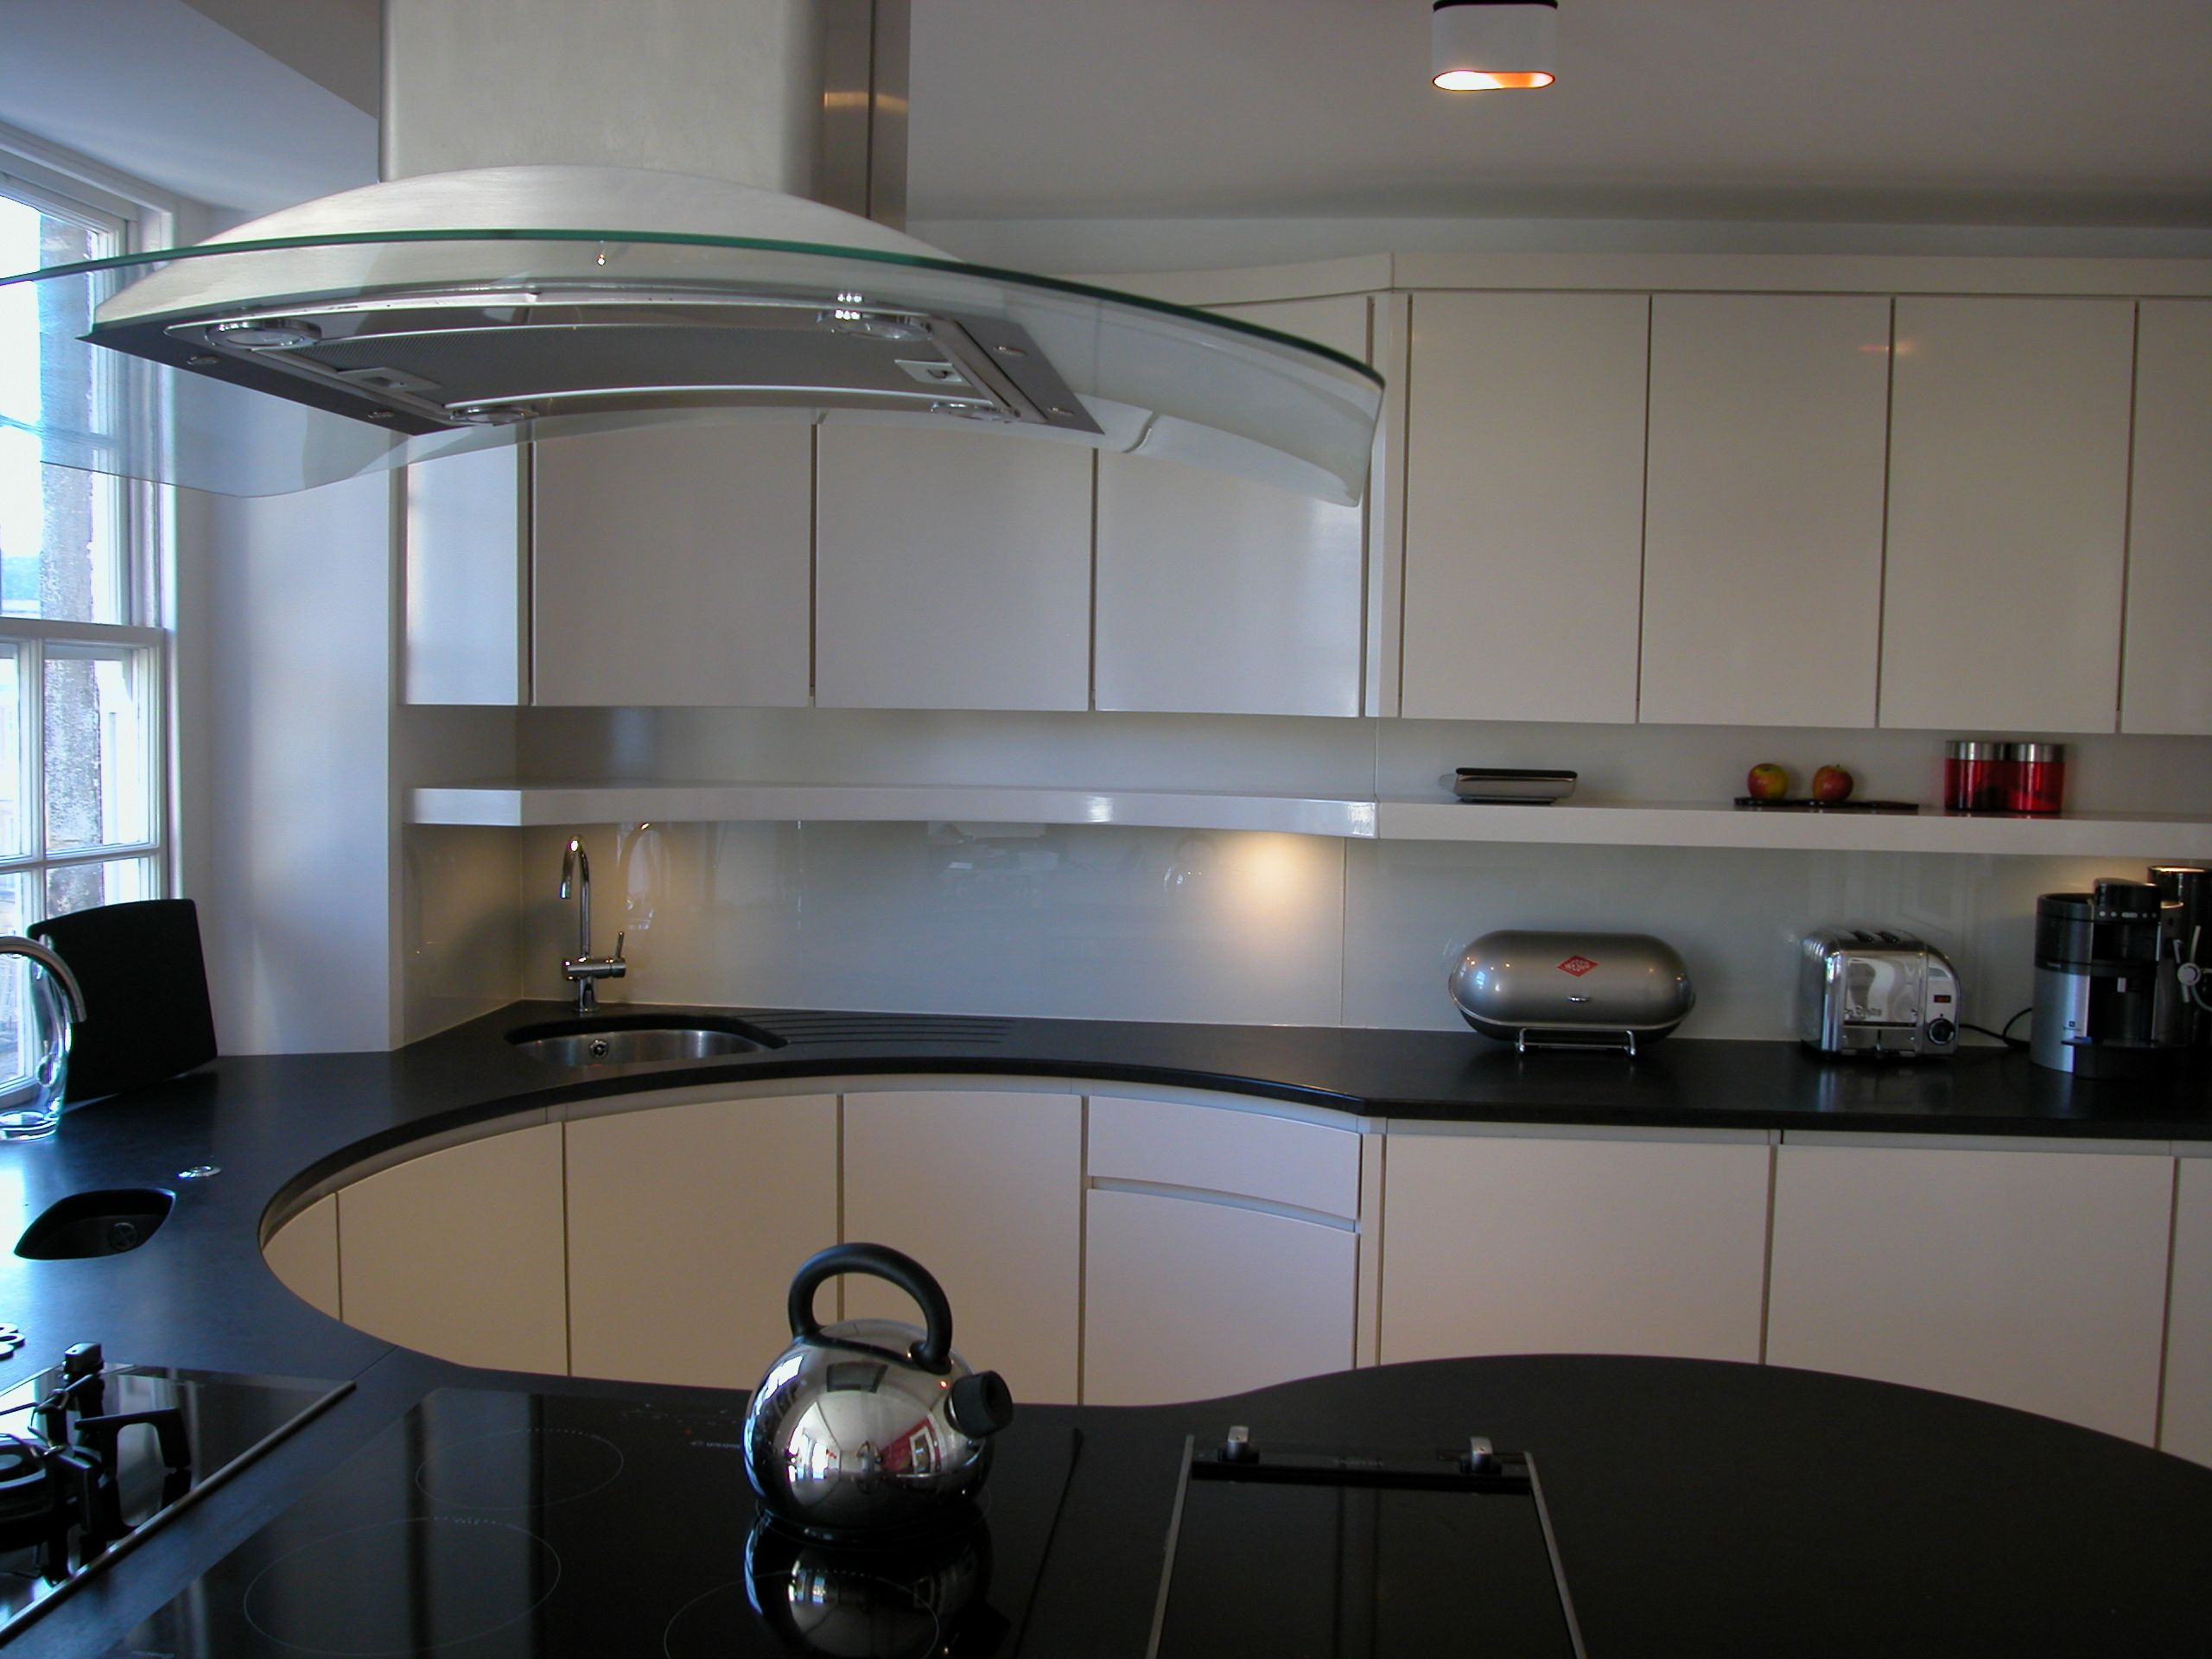 Curved Kitchen   Curved kitchen, Kitchen, Kitchen cabinets